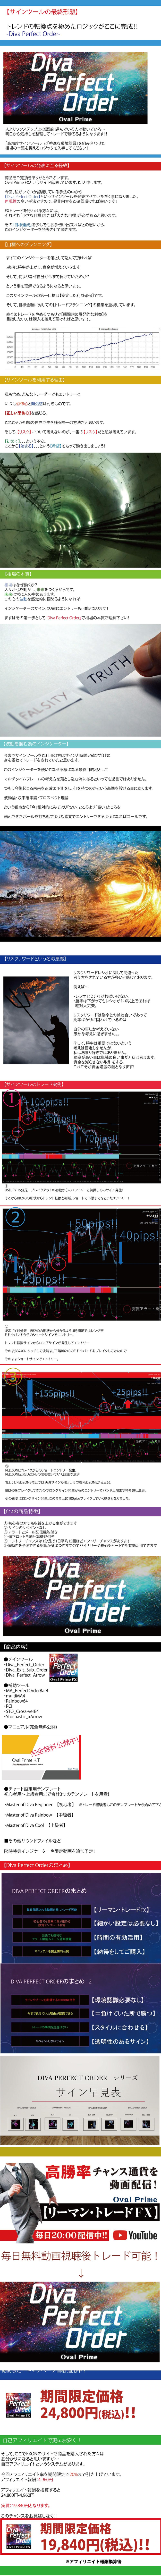 2.Diva-Perfect-Order-LP-Master.jpg